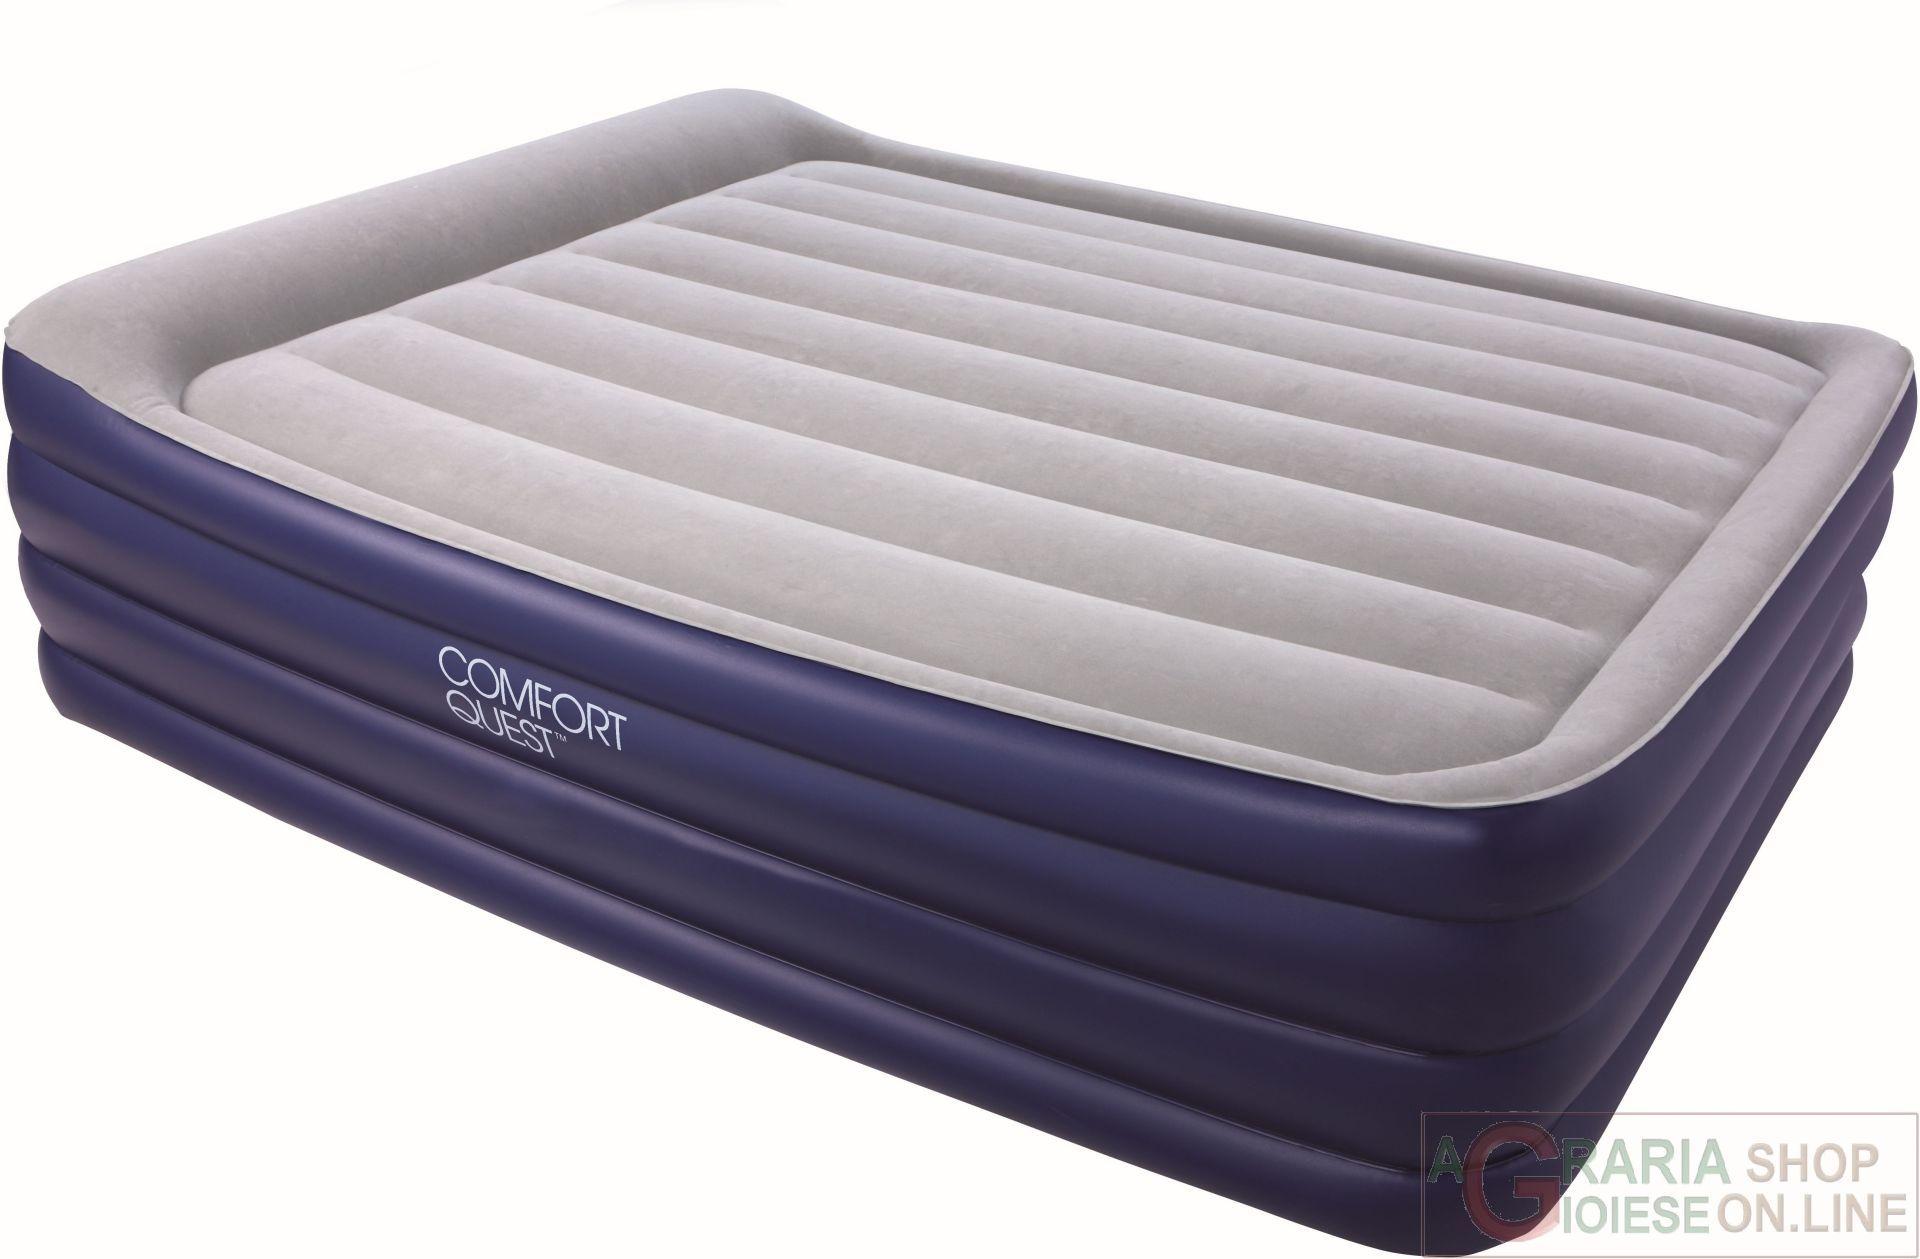 Bestway letto materasso gonfiabile matrimoniale airbed